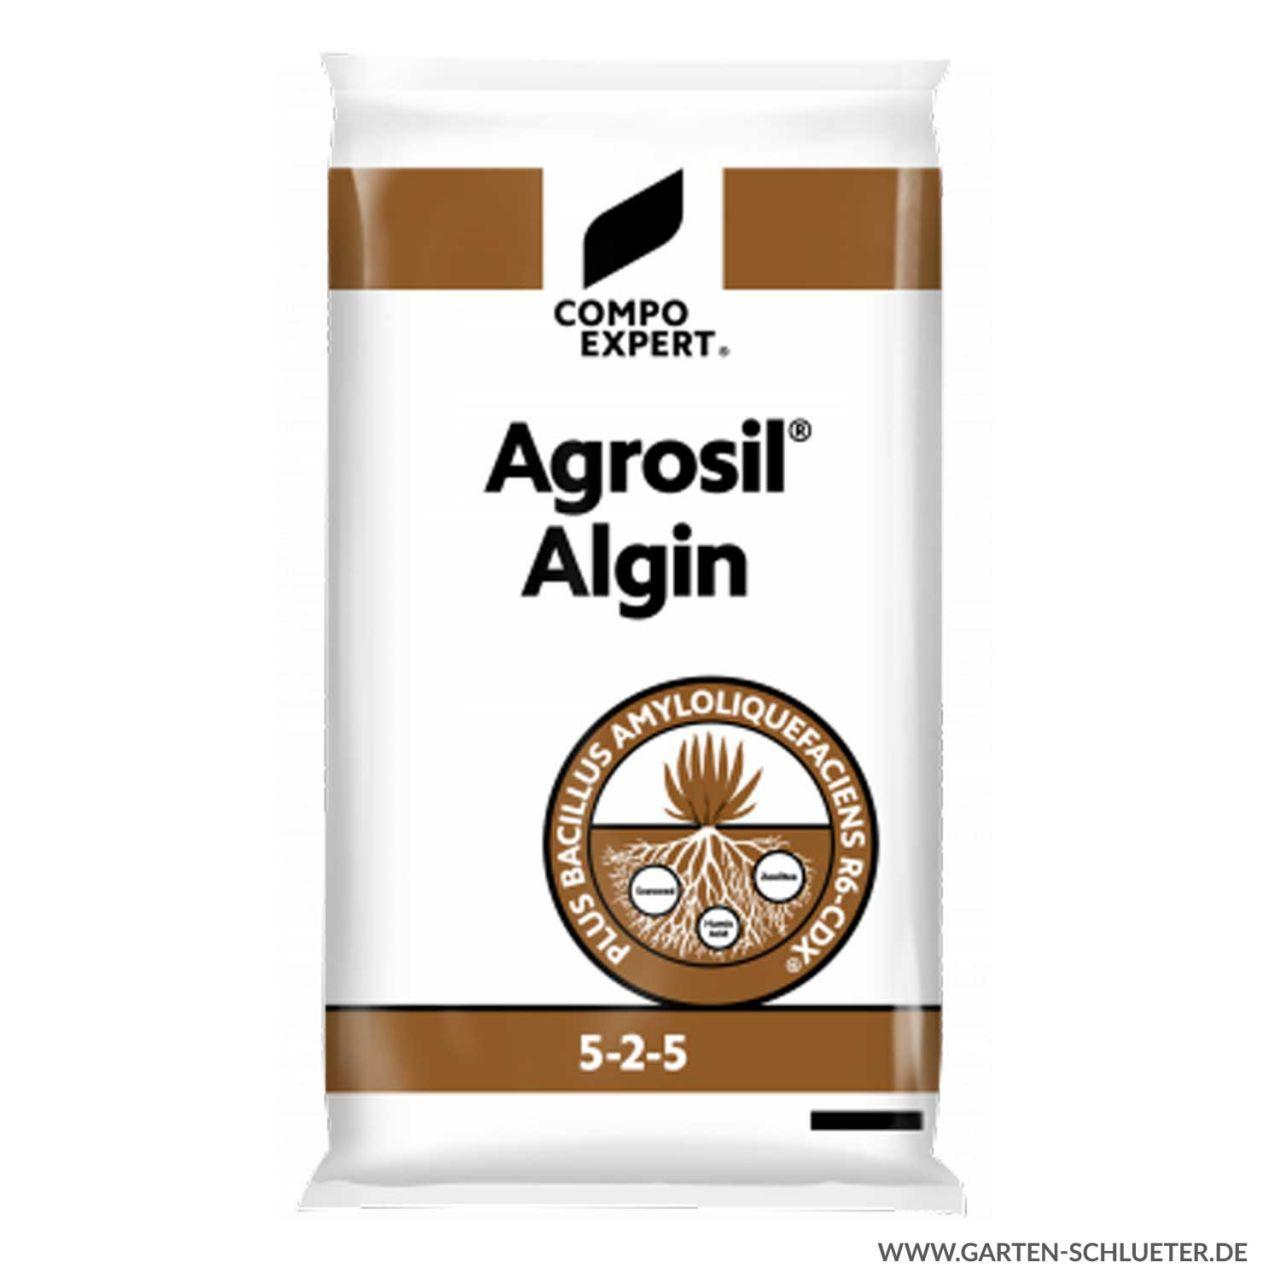 [field_kategorie] - Spezialdünger und Bodenaktivator - Compo Expert® Agrosil® Algin 5-2-5 - 25 kg